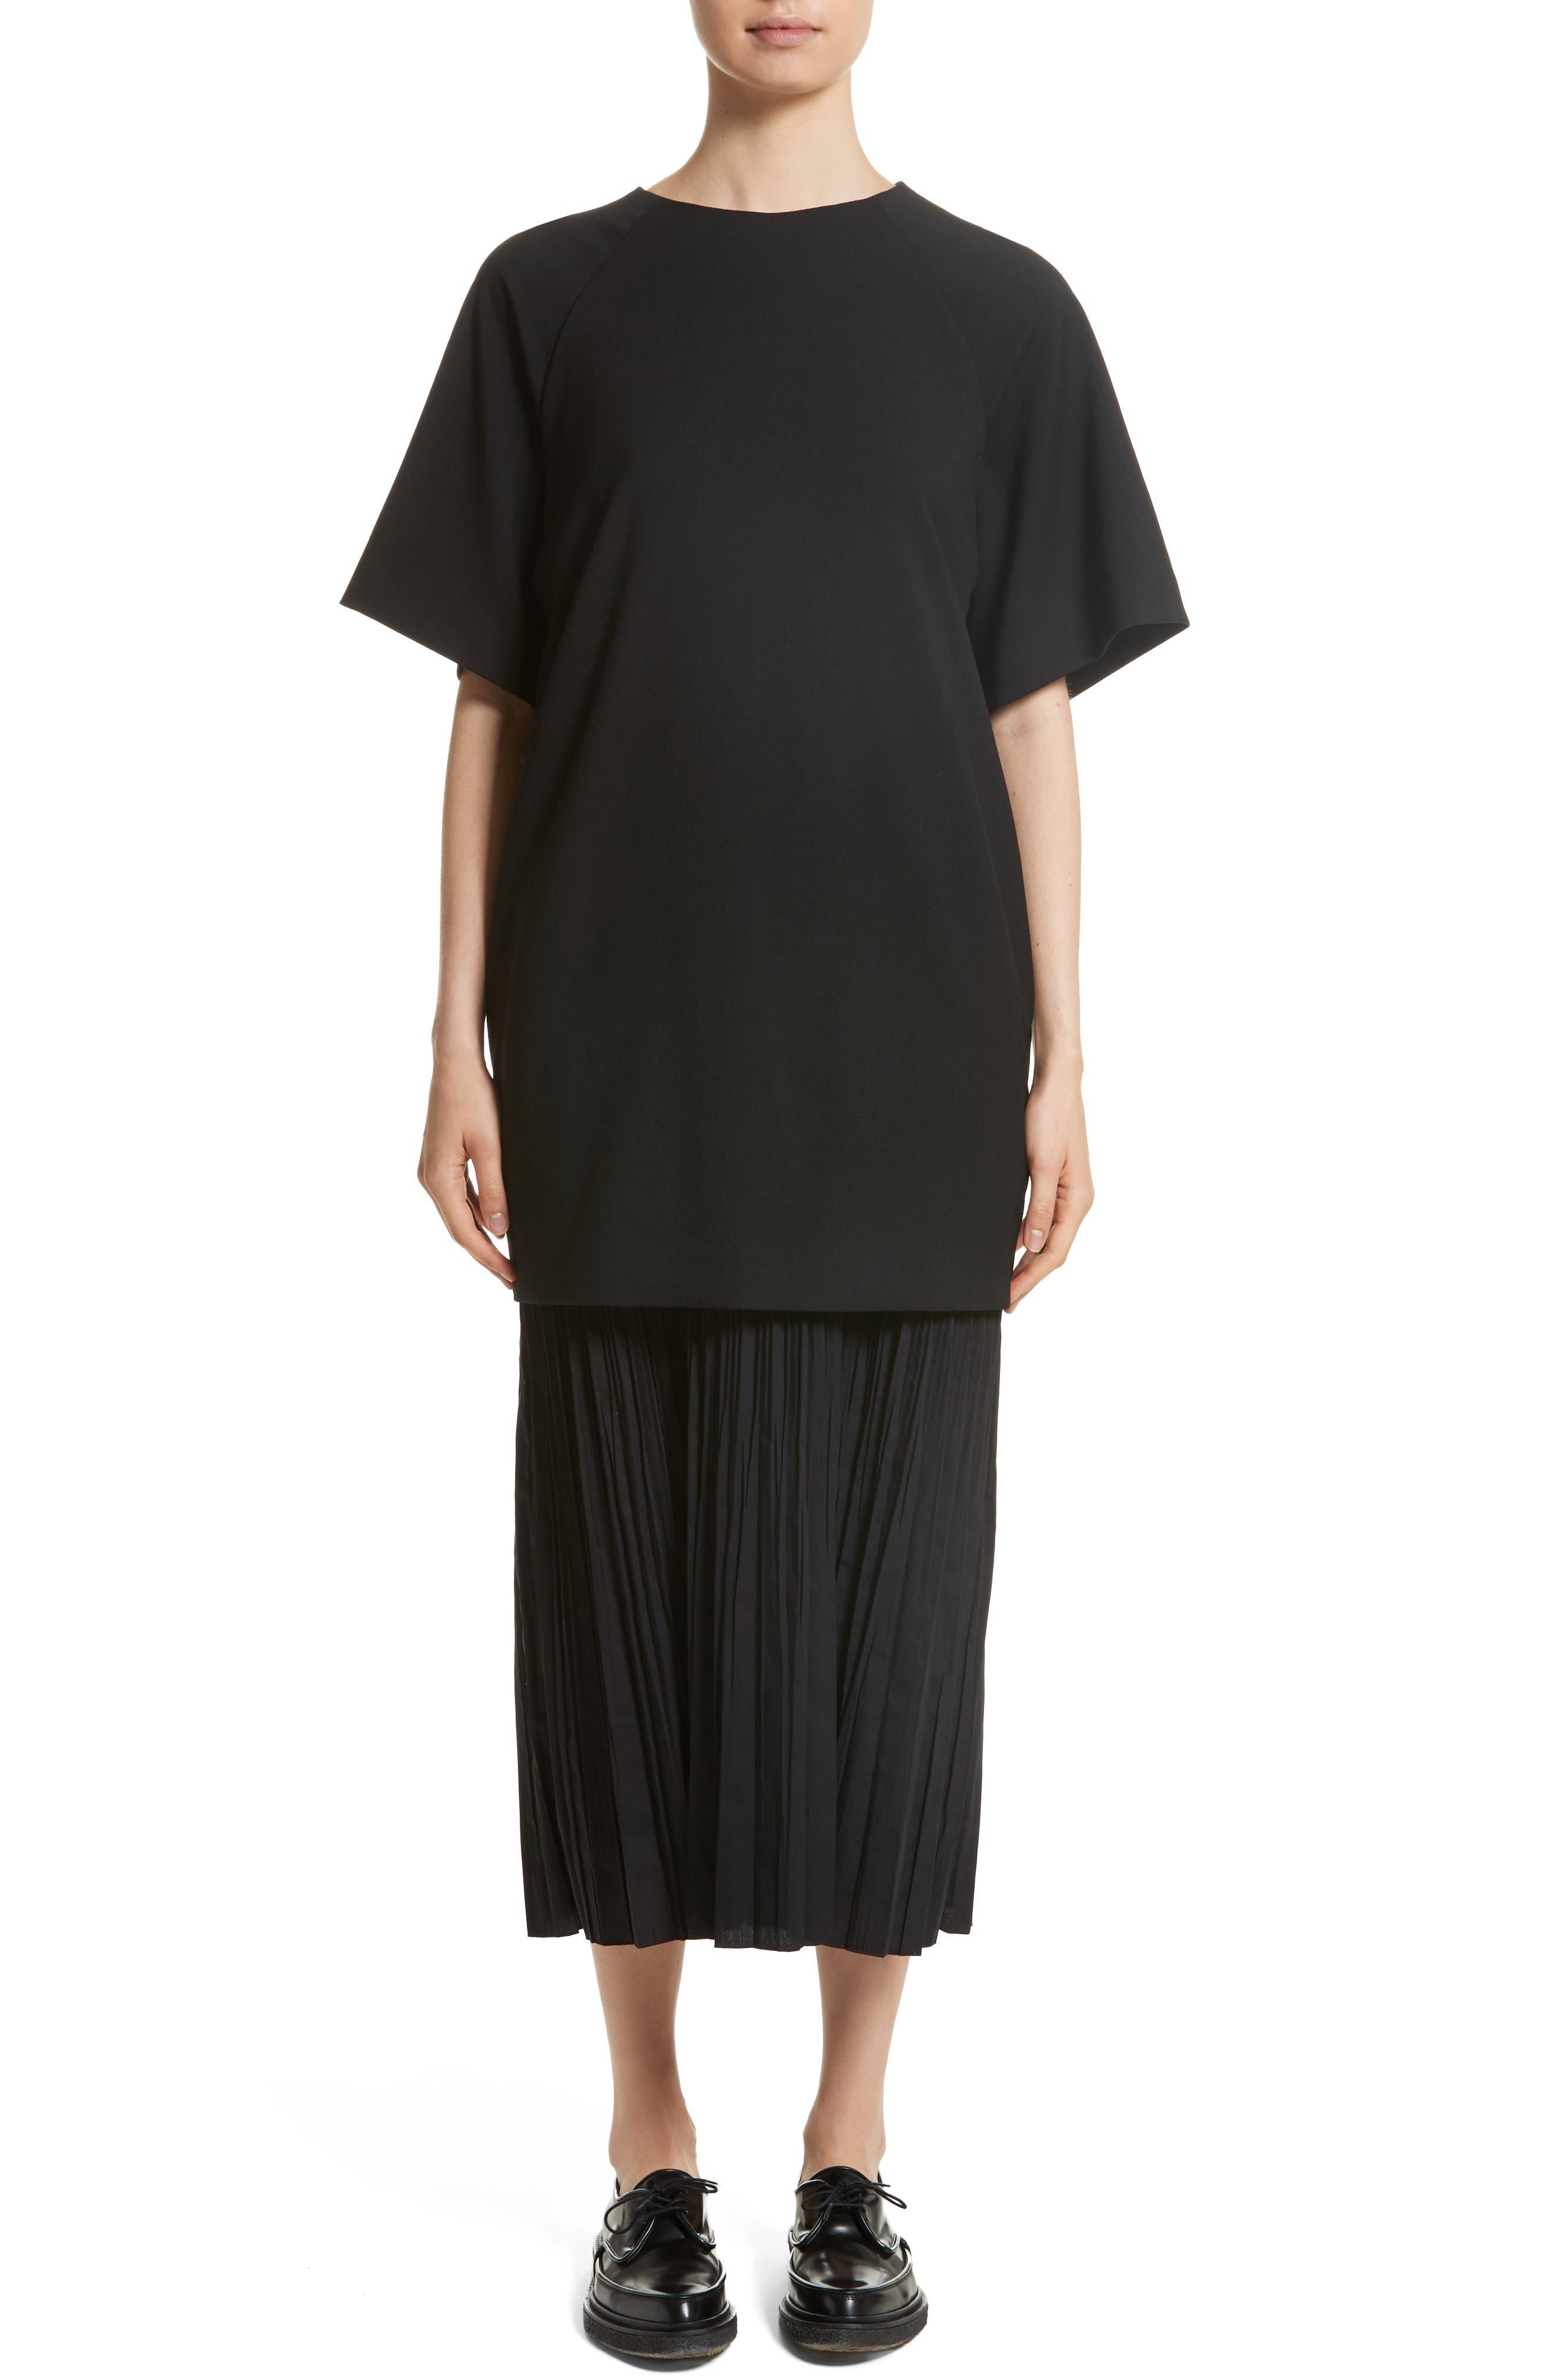 K Bottom Pleated Dress,                         Main,                         color, Black